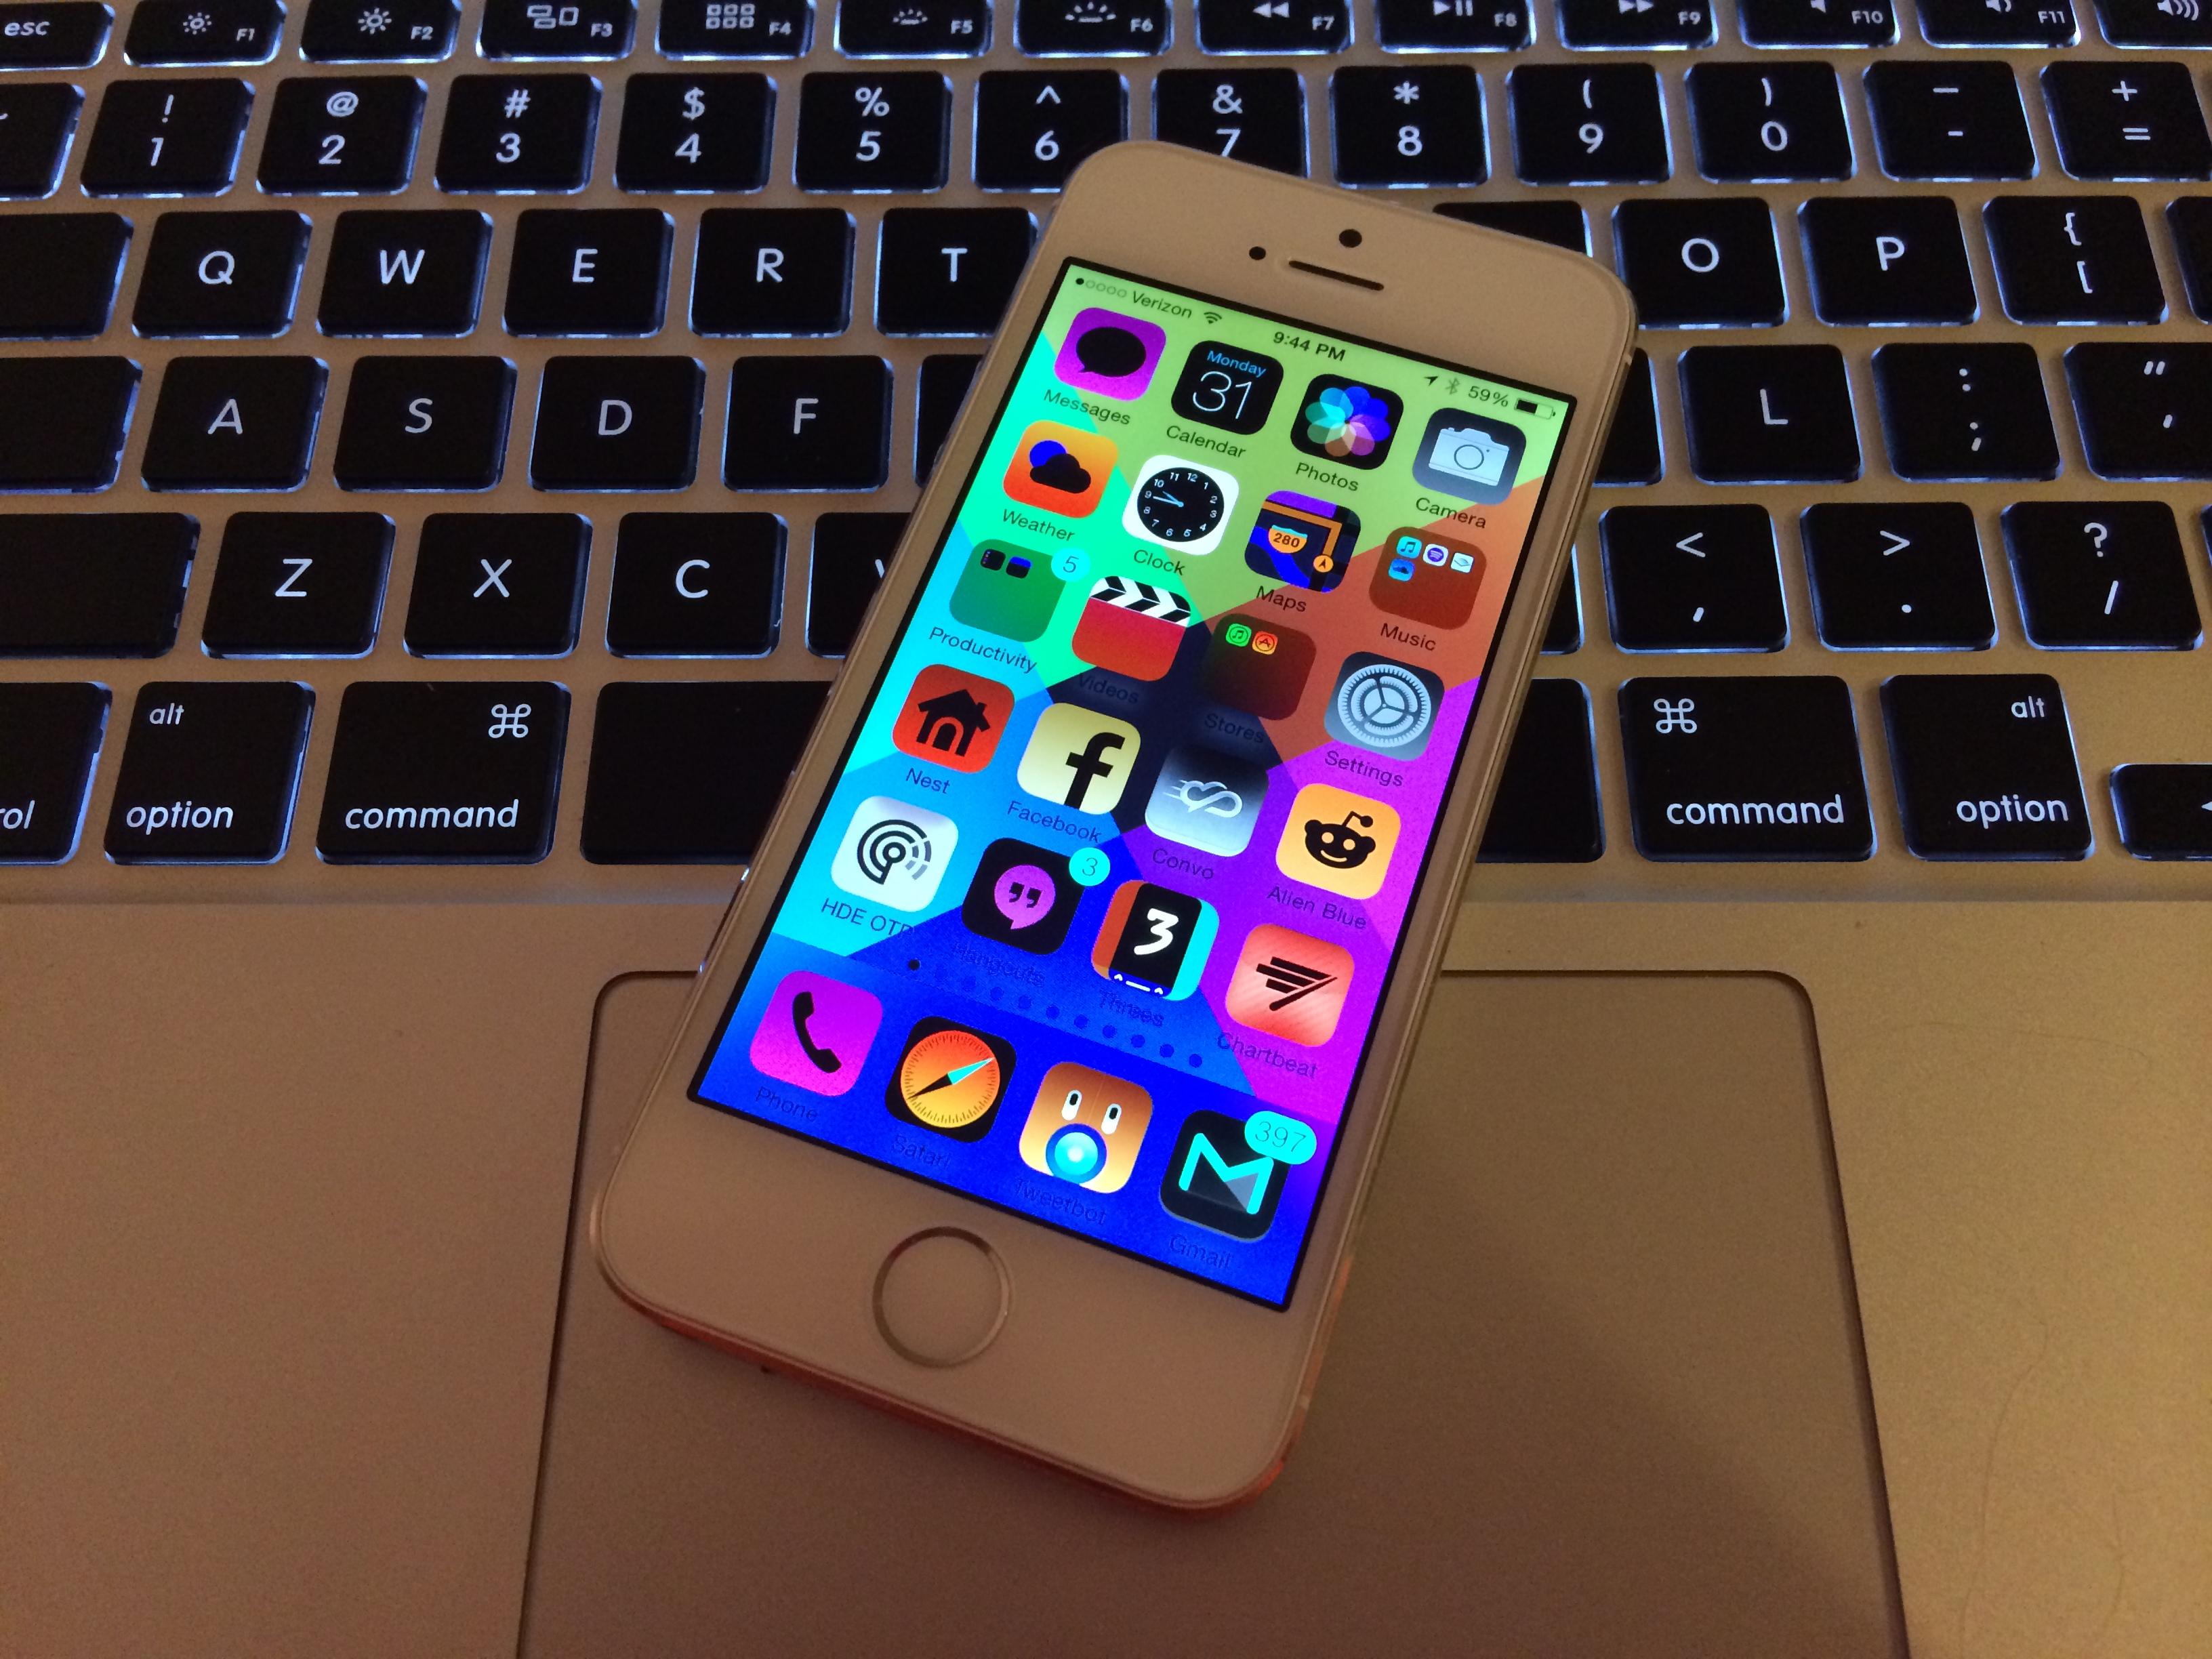 How to Fix iPhone Error 53: iOS 9 2 1 Fixes Bricked iPhones